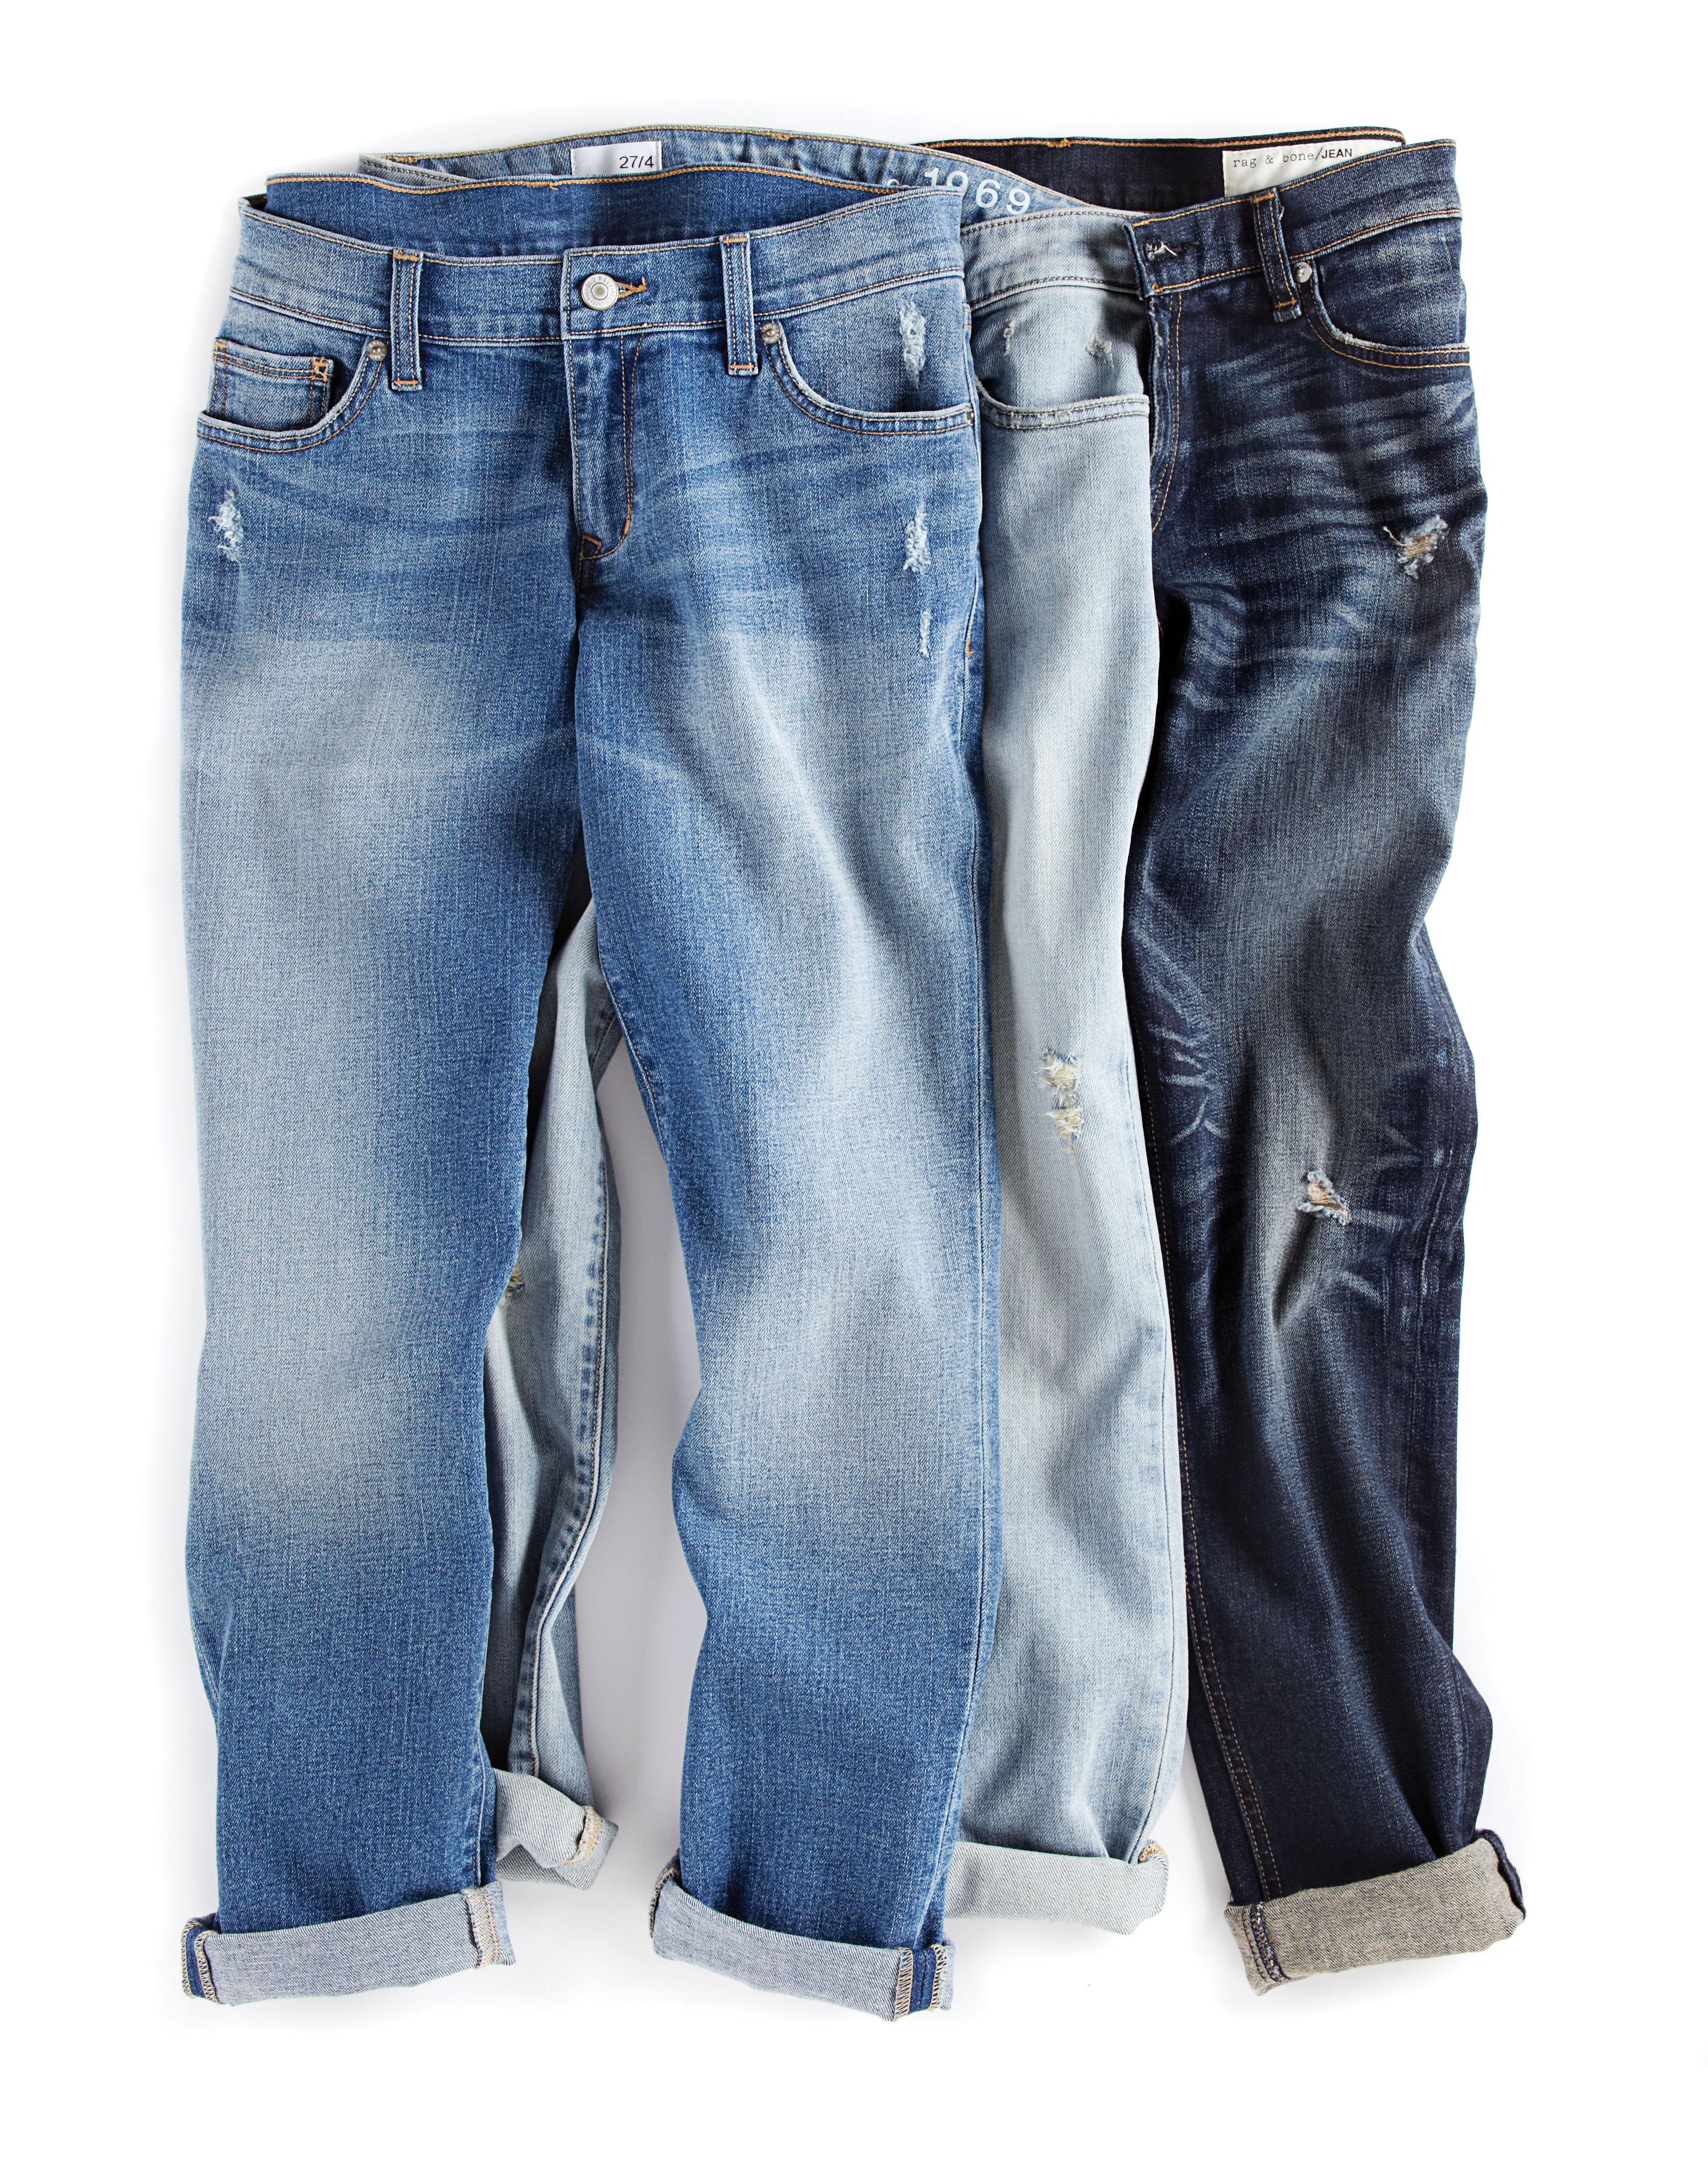 Three pairs boyfriend jeans, denim, Jan 13, p45